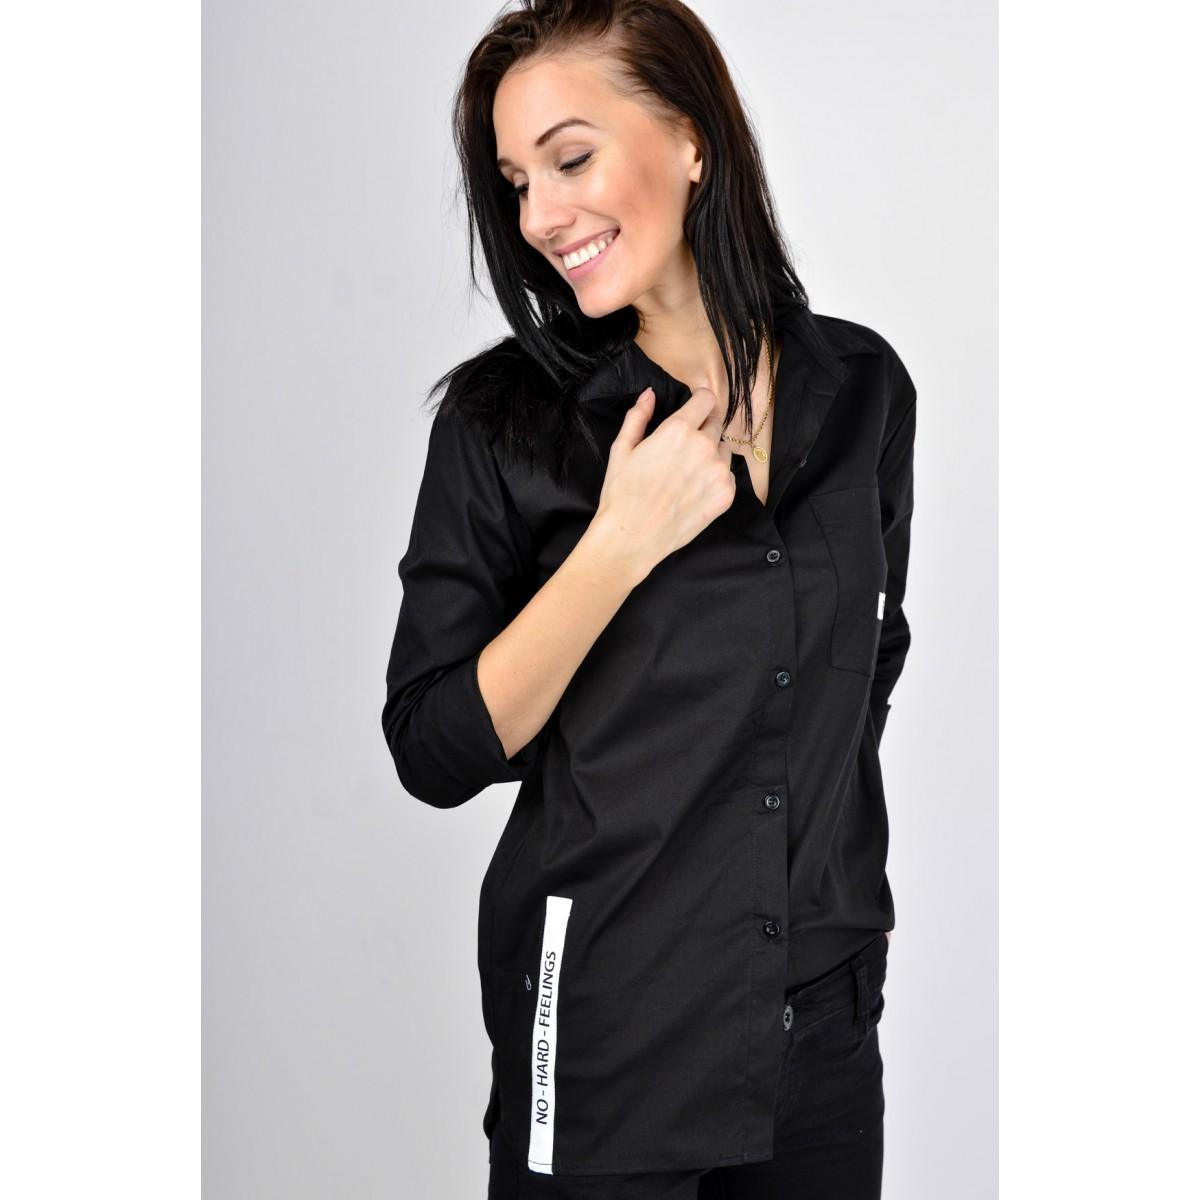 897170b5f964 Čierna dámska košeľa NK-84904-black